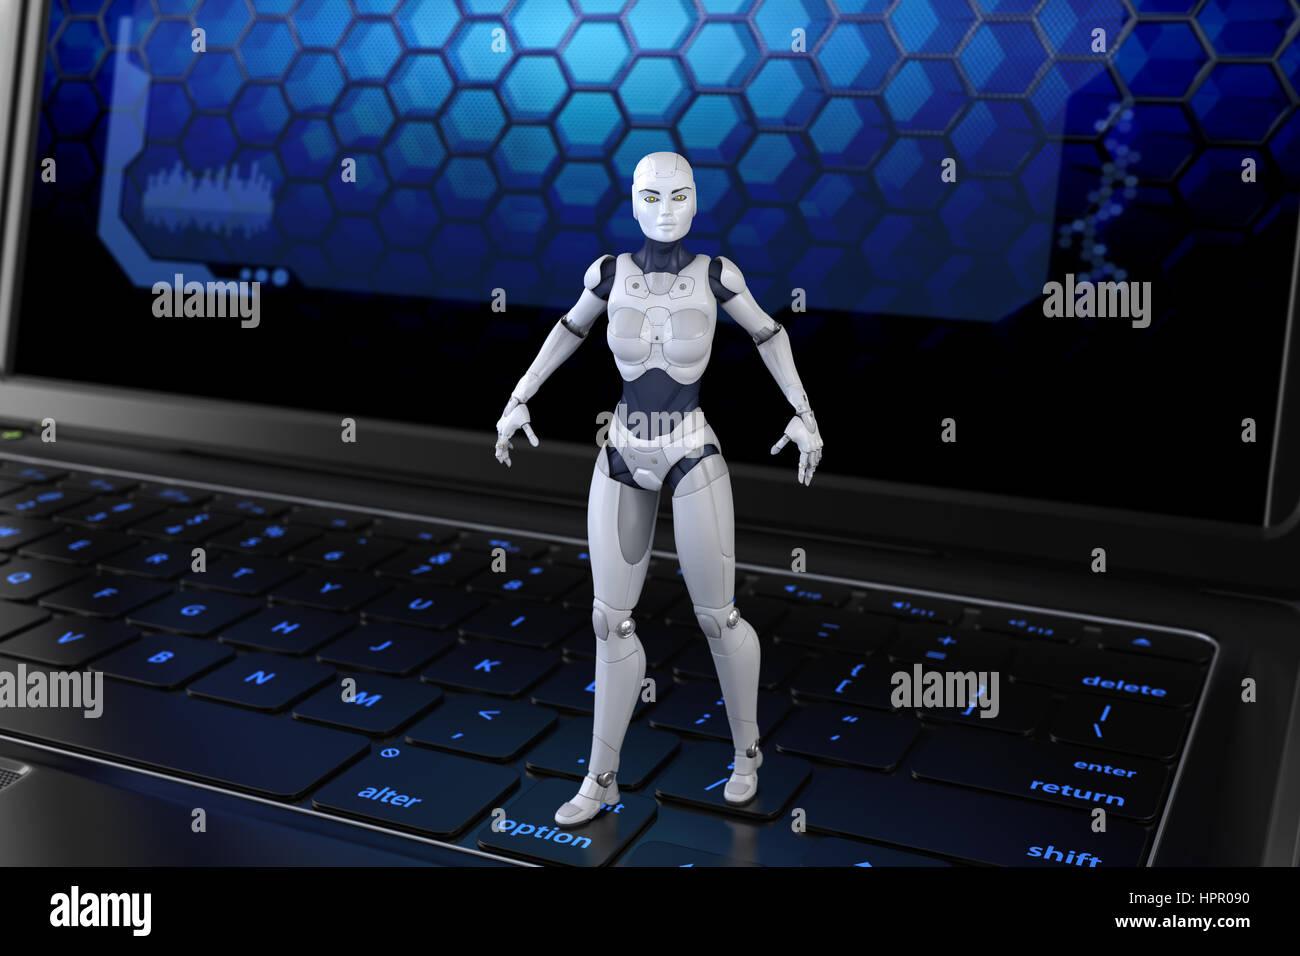 Robot standing on keyboard. 3D illustration - Stock Image